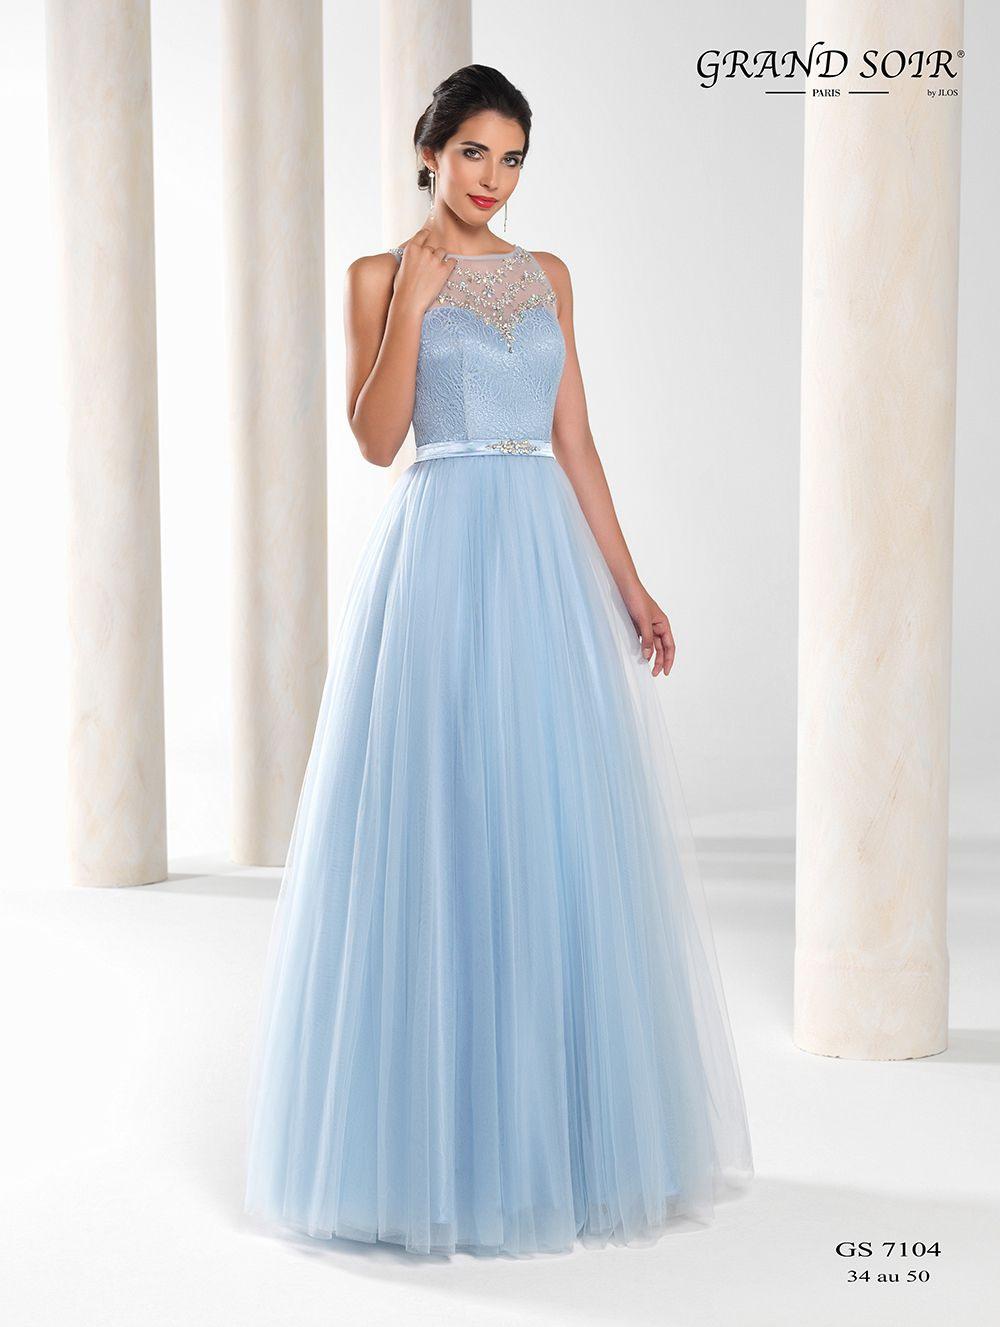 Designer Kreativ Abendkleider Teenager Vertrieb - Abendkleid